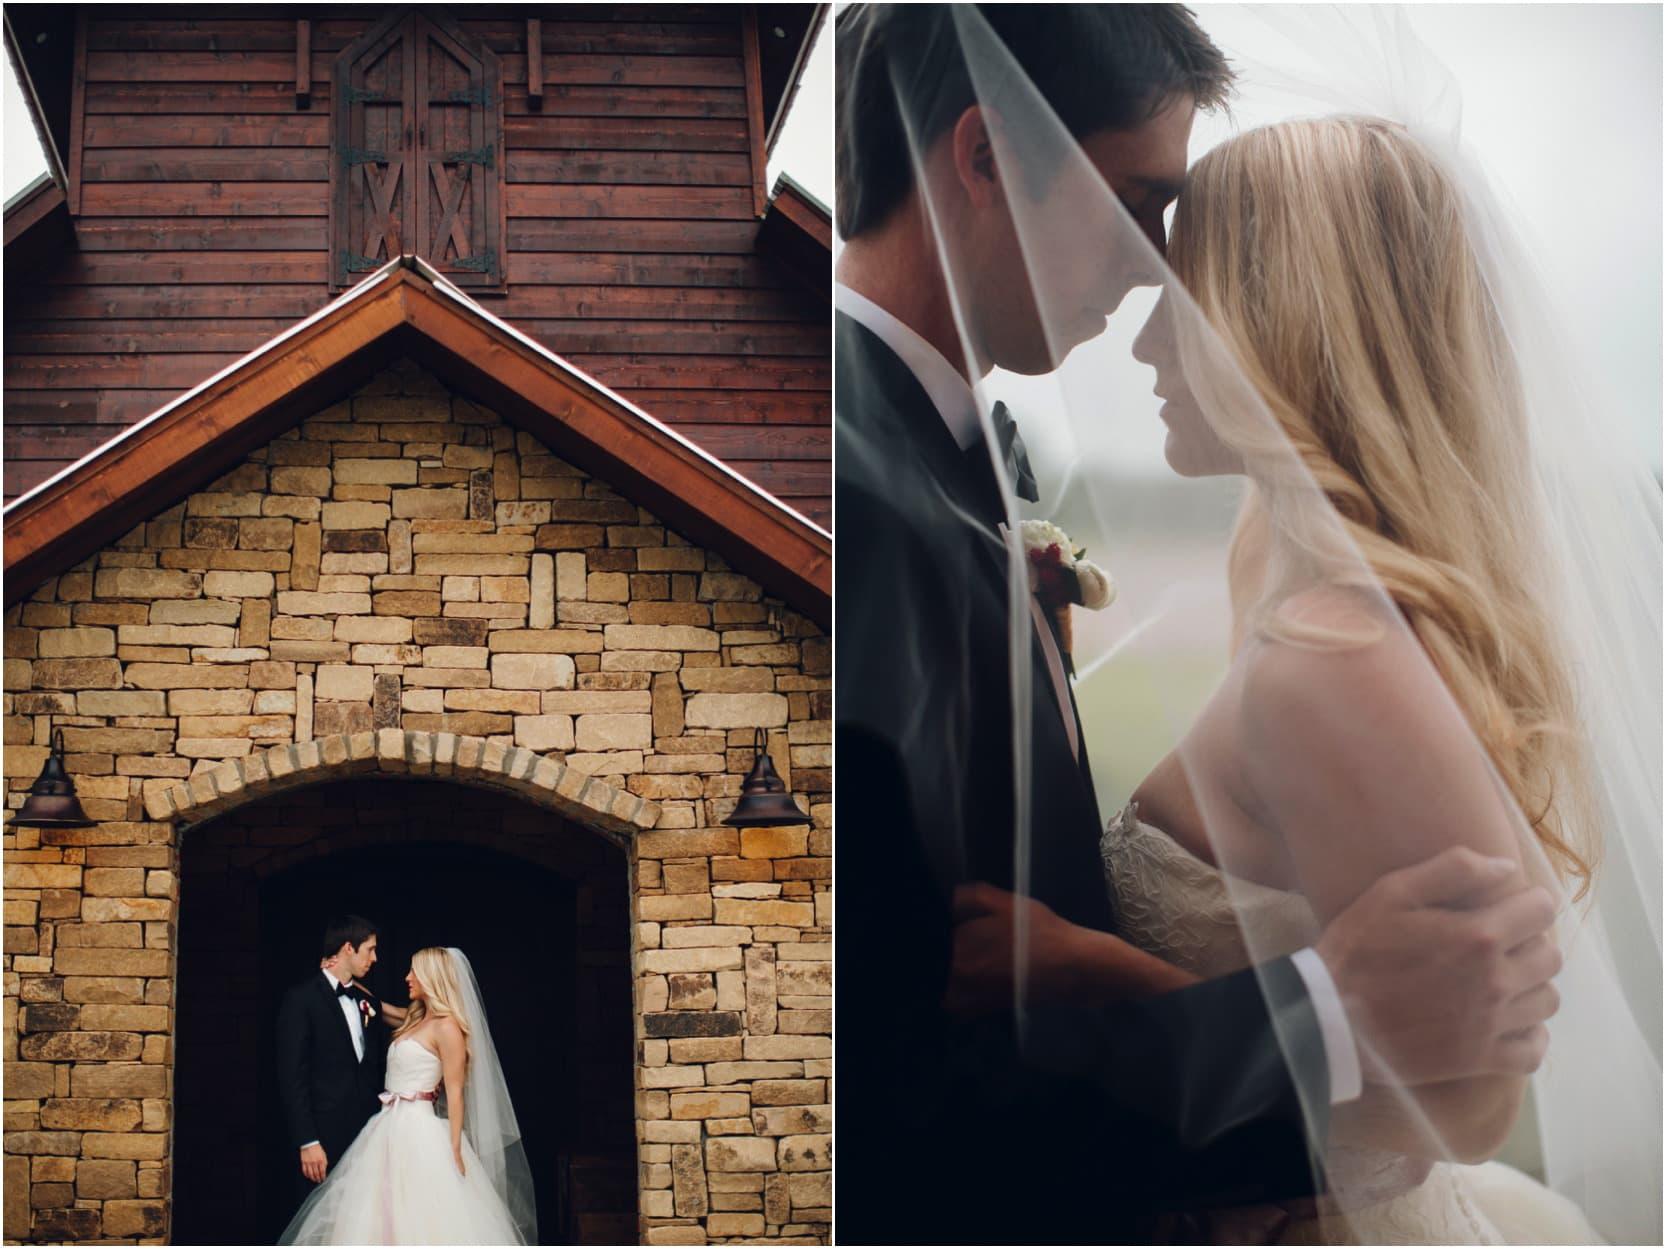 coderhillengburg_oklahoma_wedding__442_blogstomped